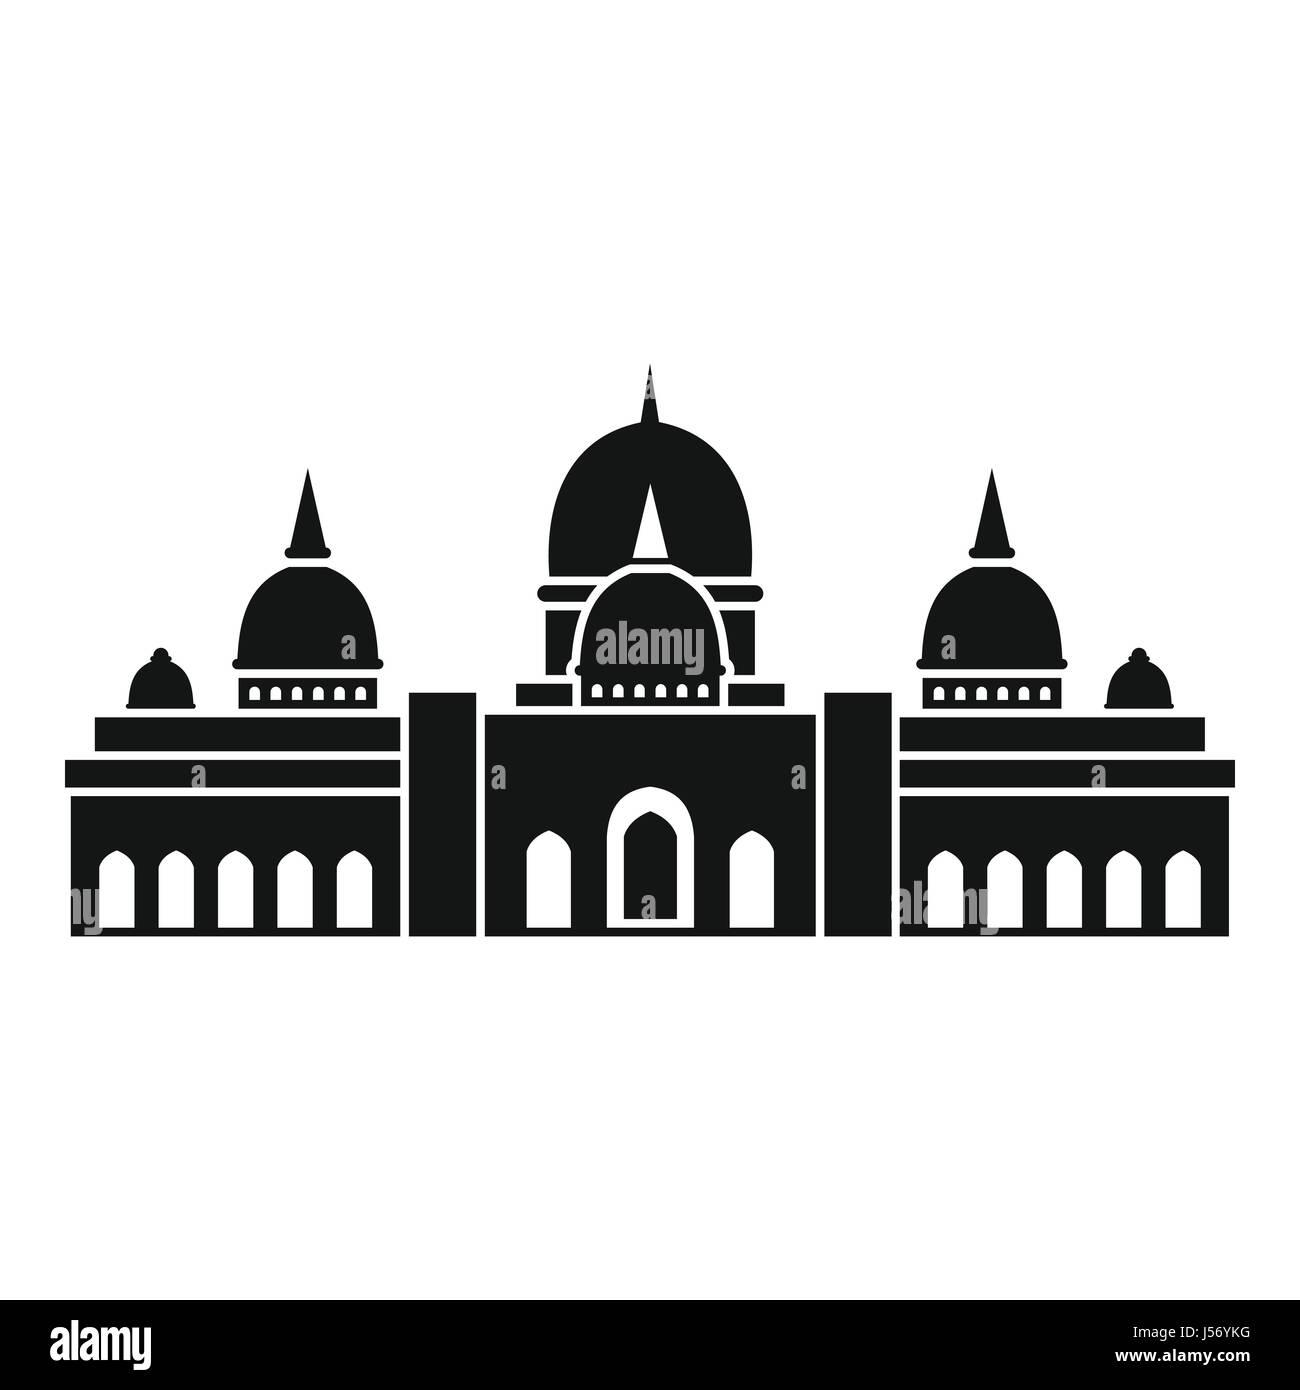 Sheikh Zayed Grand Mosque, UAE icon - Stock Image